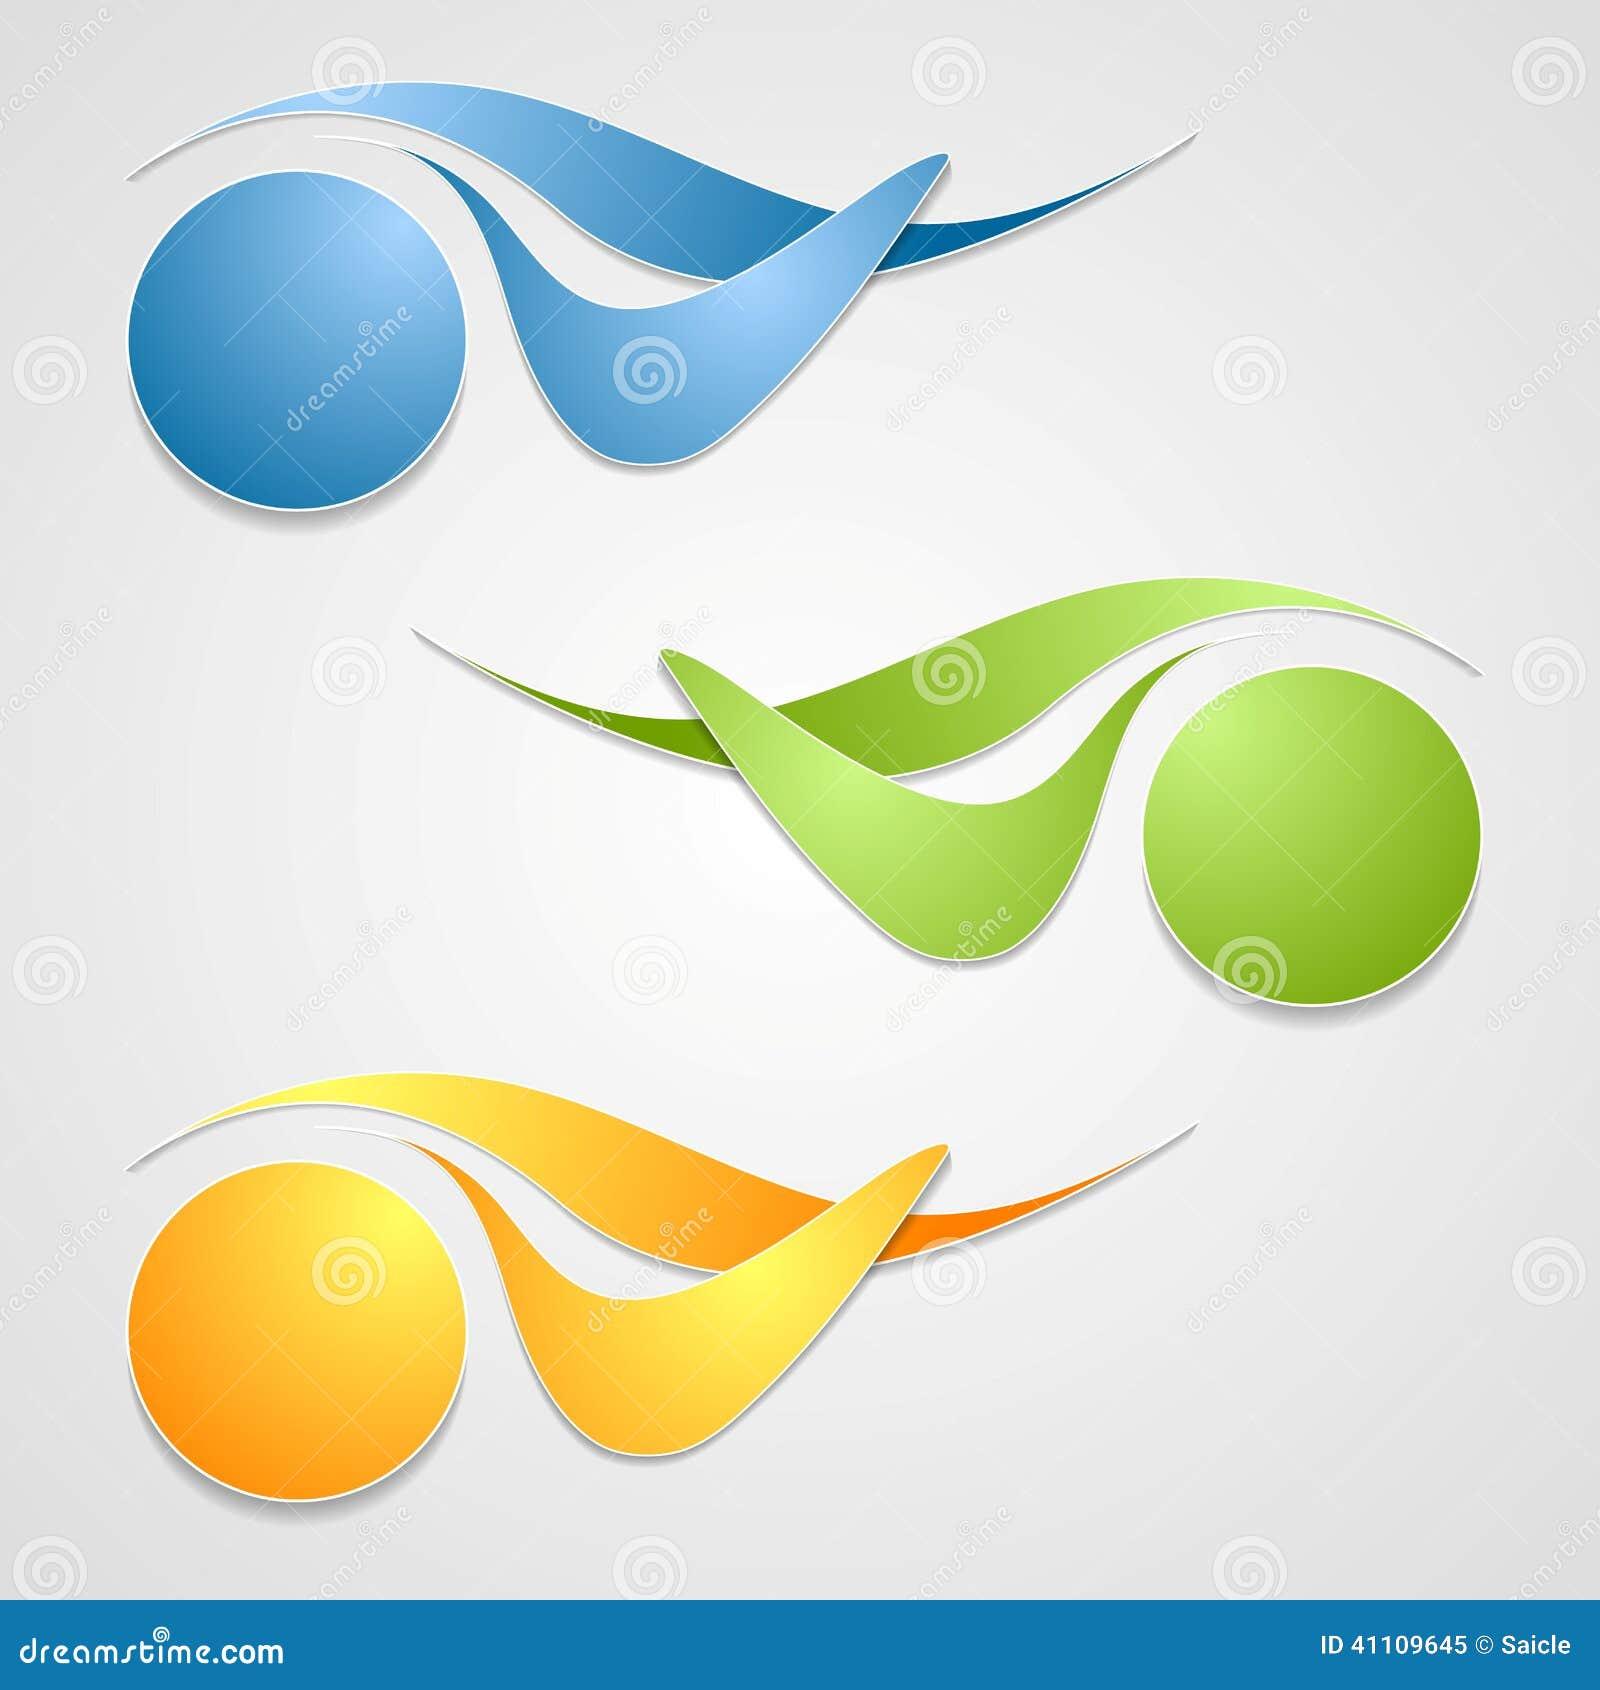 abstract logo shapes template design stock vector image 41109645. Black Bedroom Furniture Sets. Home Design Ideas